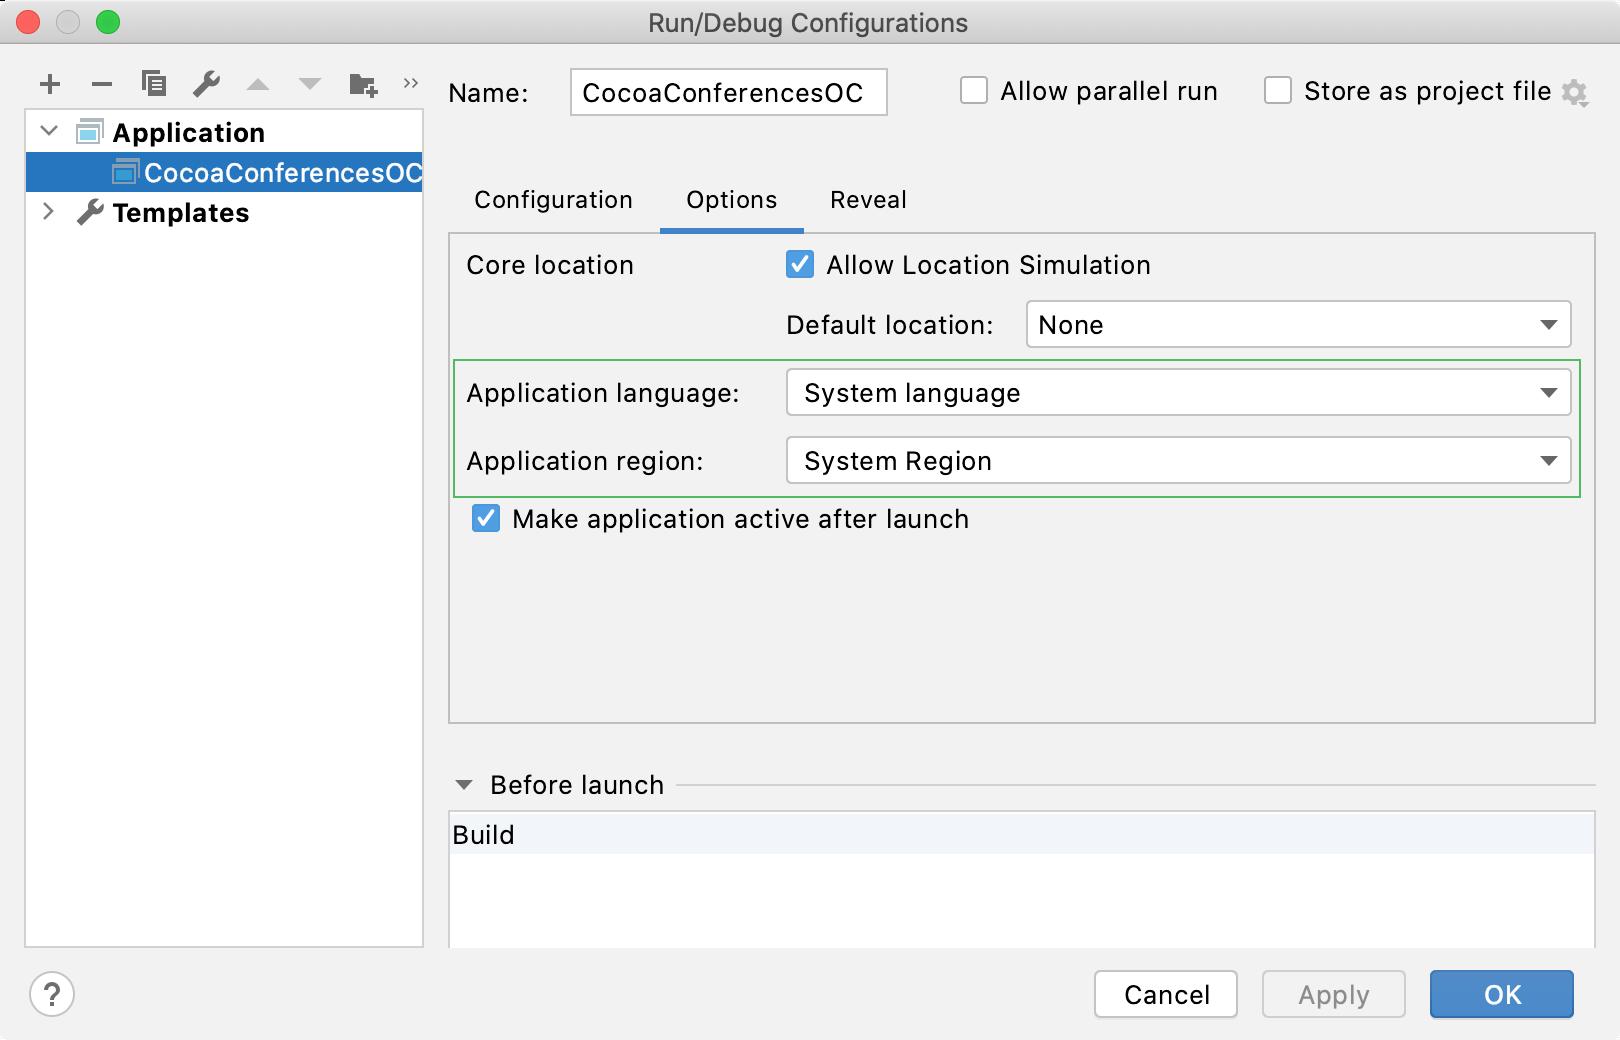 Change application language